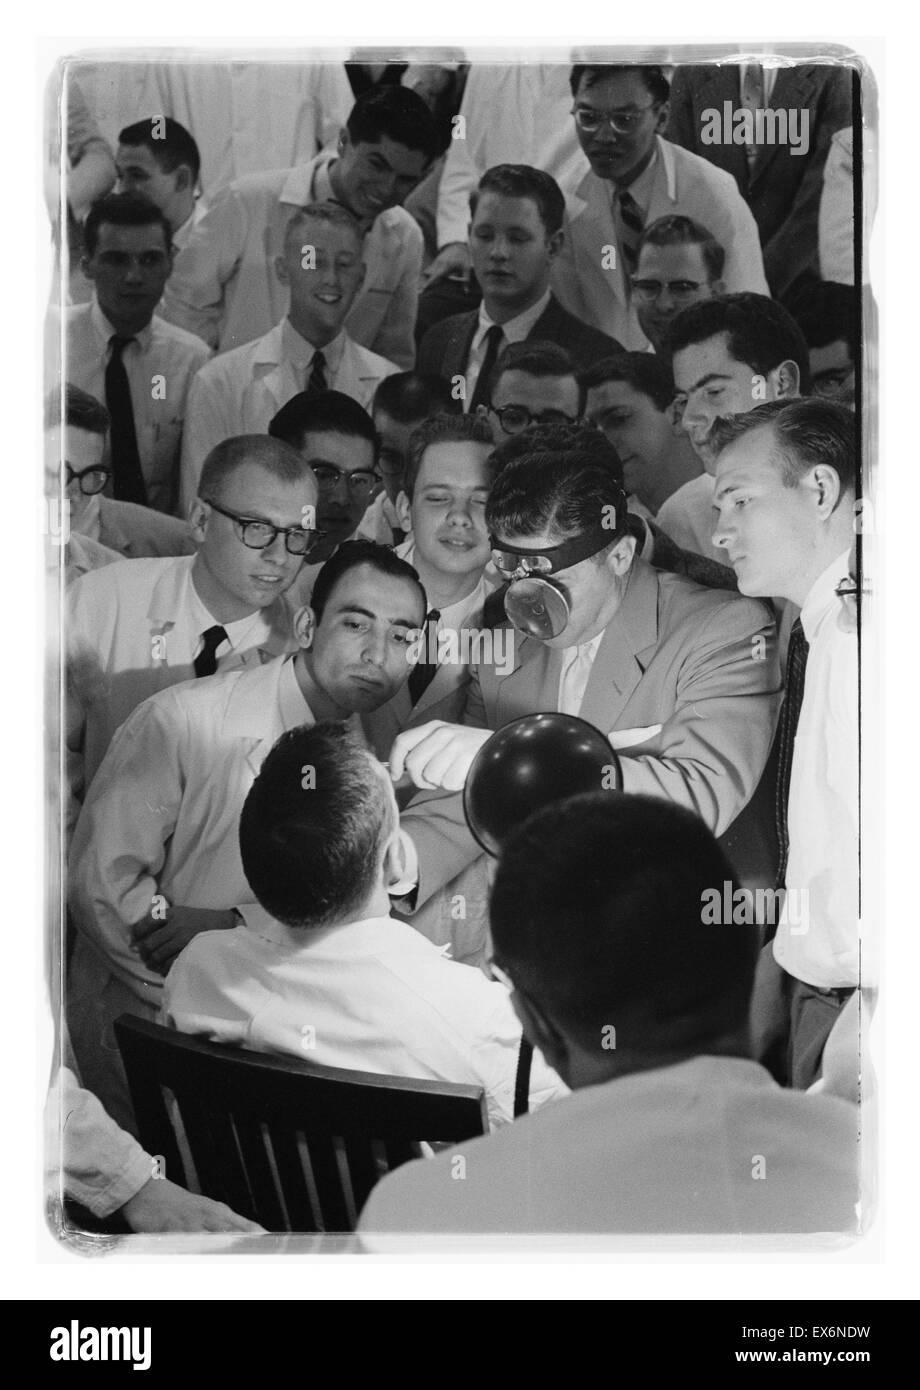 George Washington University Medical School, Washington, D.C. Students in class 1958 - Stock Image